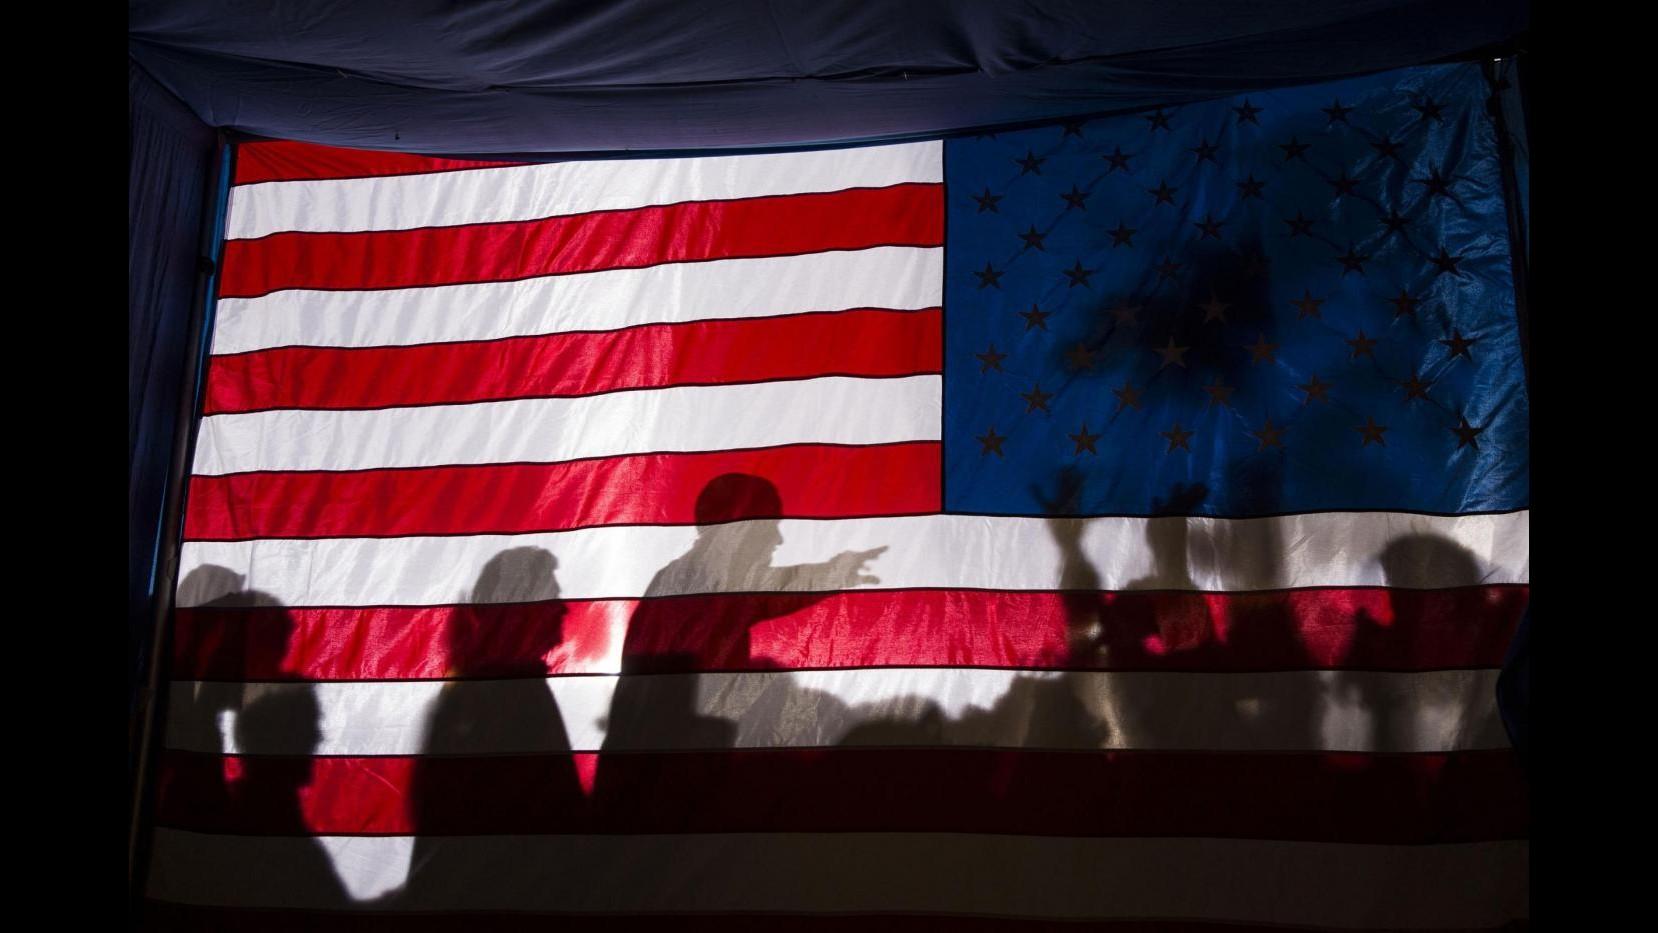 Usa 2016, ex governatore del Maryland O'Malley annuncia candidatura